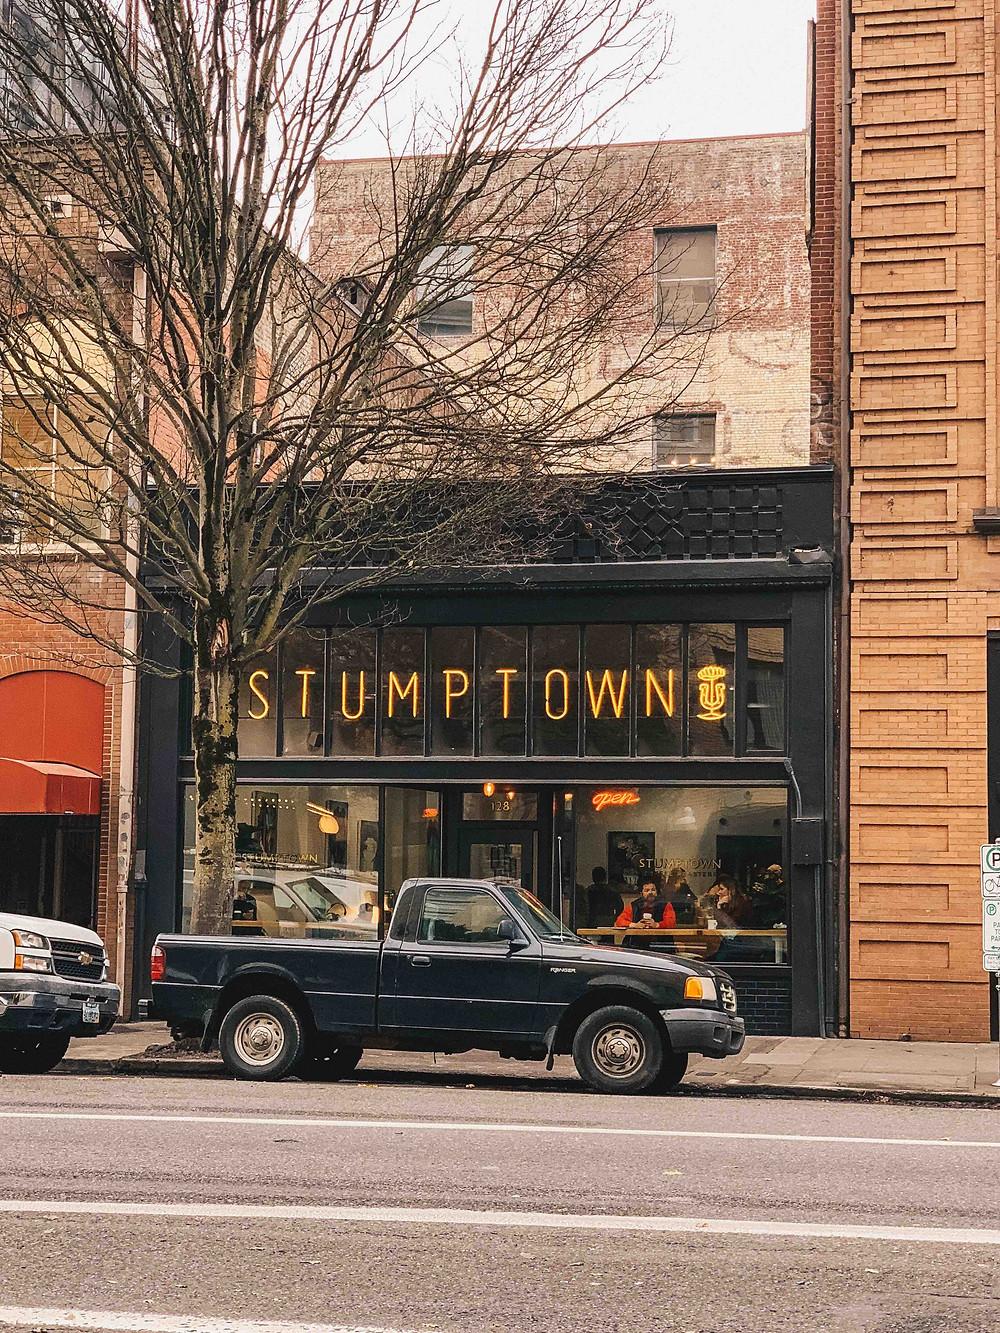 Stumptown coffee เที่ยวอเมริกา โรดทริป America West Coast Road Trip USA เที่ยวอเมริกาด้วยตัวเอง เช่ารถขับ รอบอเมริกา ซานฟรานซิสโก แคลิฟอเนียร์ ซีแอตเทิล ลอสแองเจลิส ซานดิเอโก้ พอร์ทแลนด์ Portland San Diego Los Angeles Seattle California ร้านอร่อย ร้านอาหาร คาเฟ่ ช็อปปิ้ง ชอปปิ้ง จุดน่าแวะในอเมริกา ขับรถรอบอเมริกา